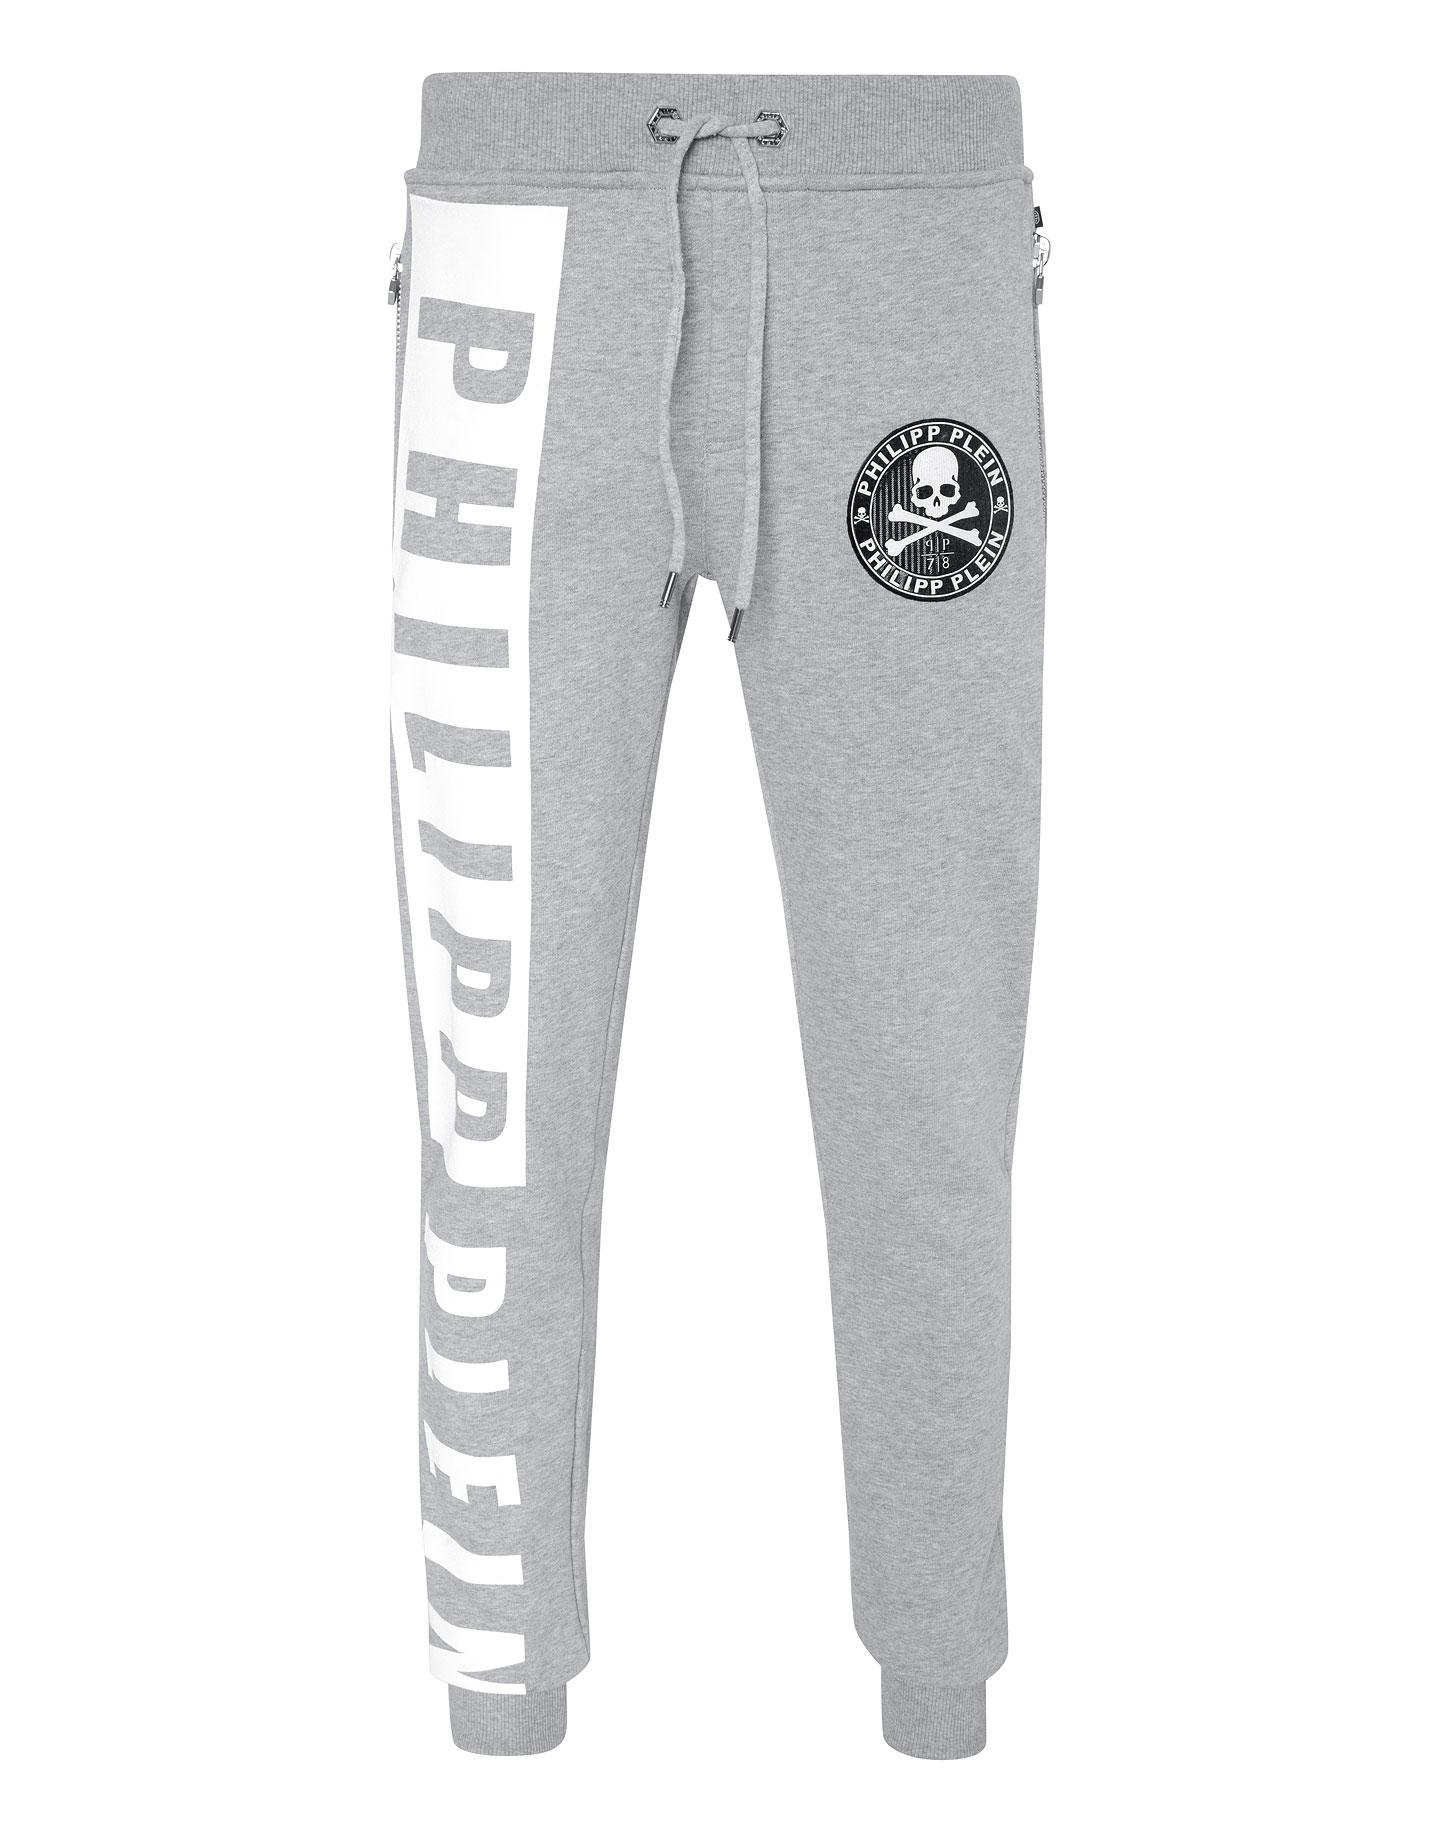 and ashland c by wear pants clothing movement s xcvi fqqiyug p athleisure womens comforter comfortable women stylish